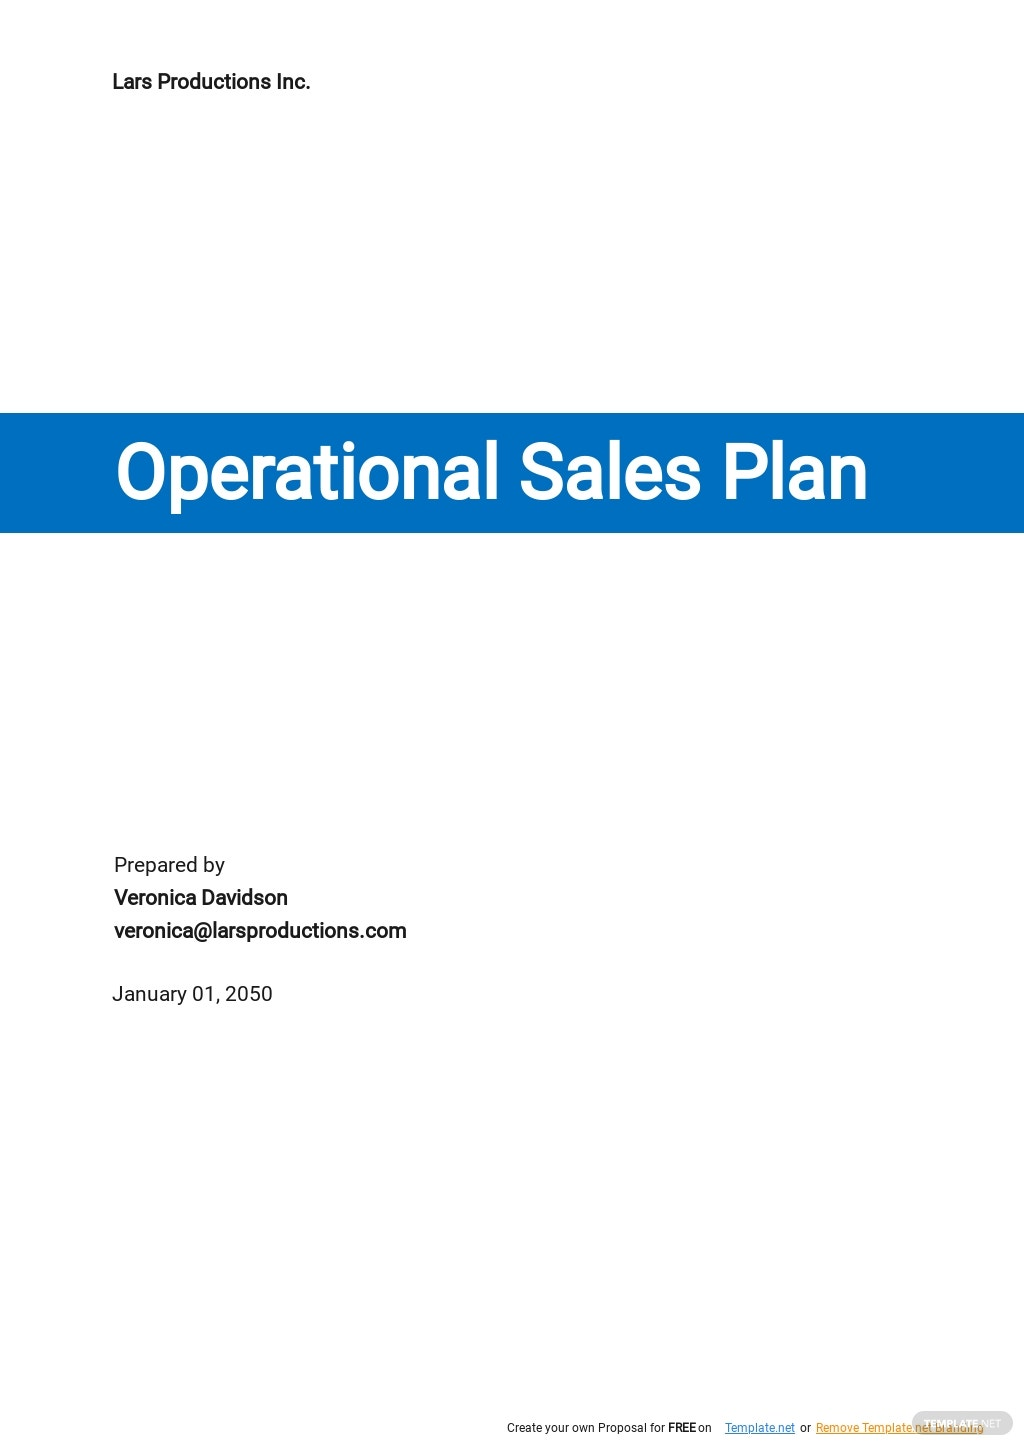 Operational Sales Plan.jpe